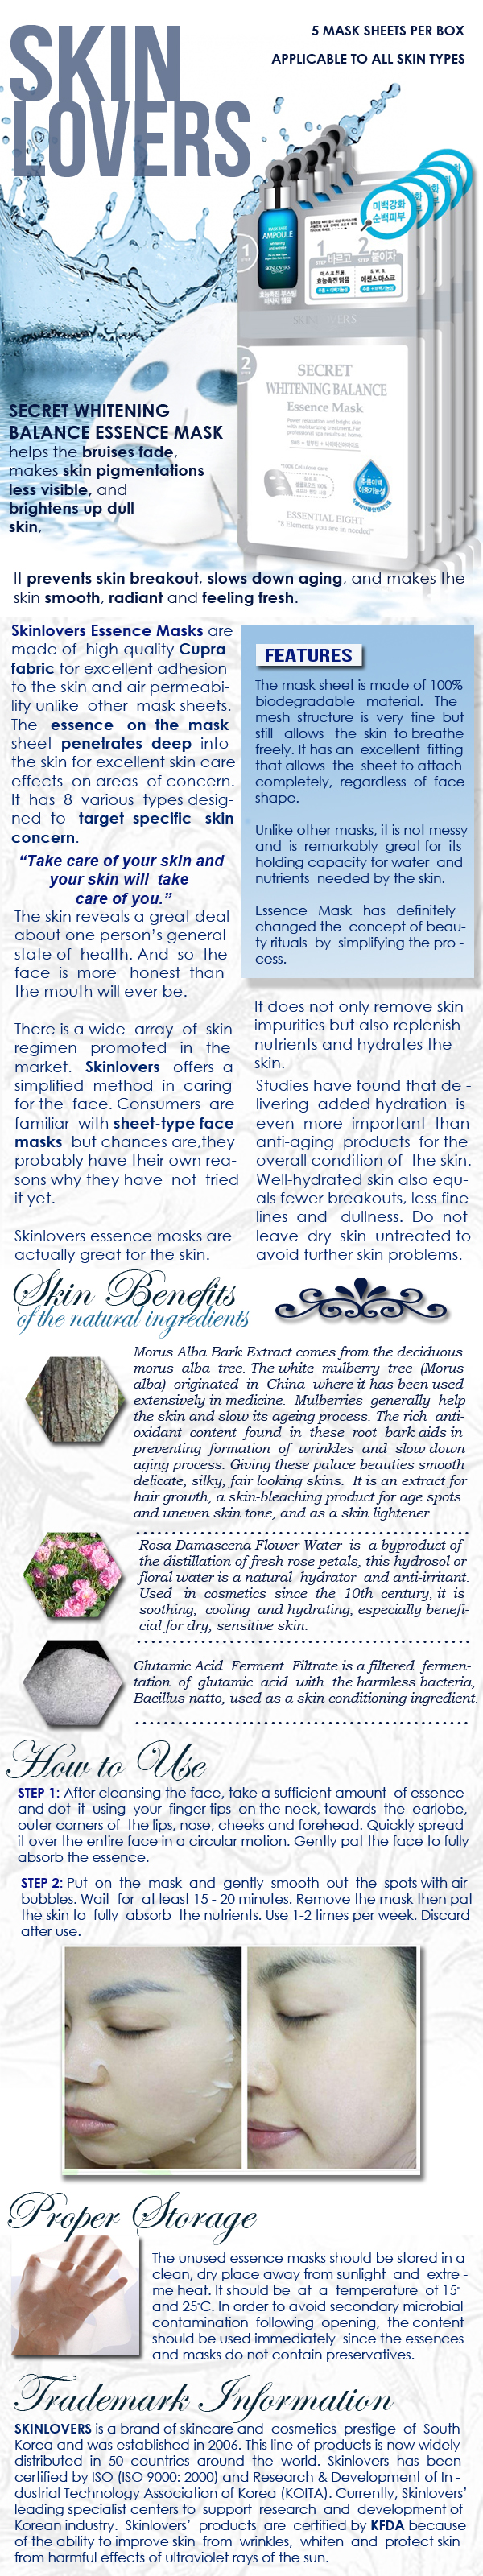 Skinlovers Secret Whitening Balance Essence Mask Product Information